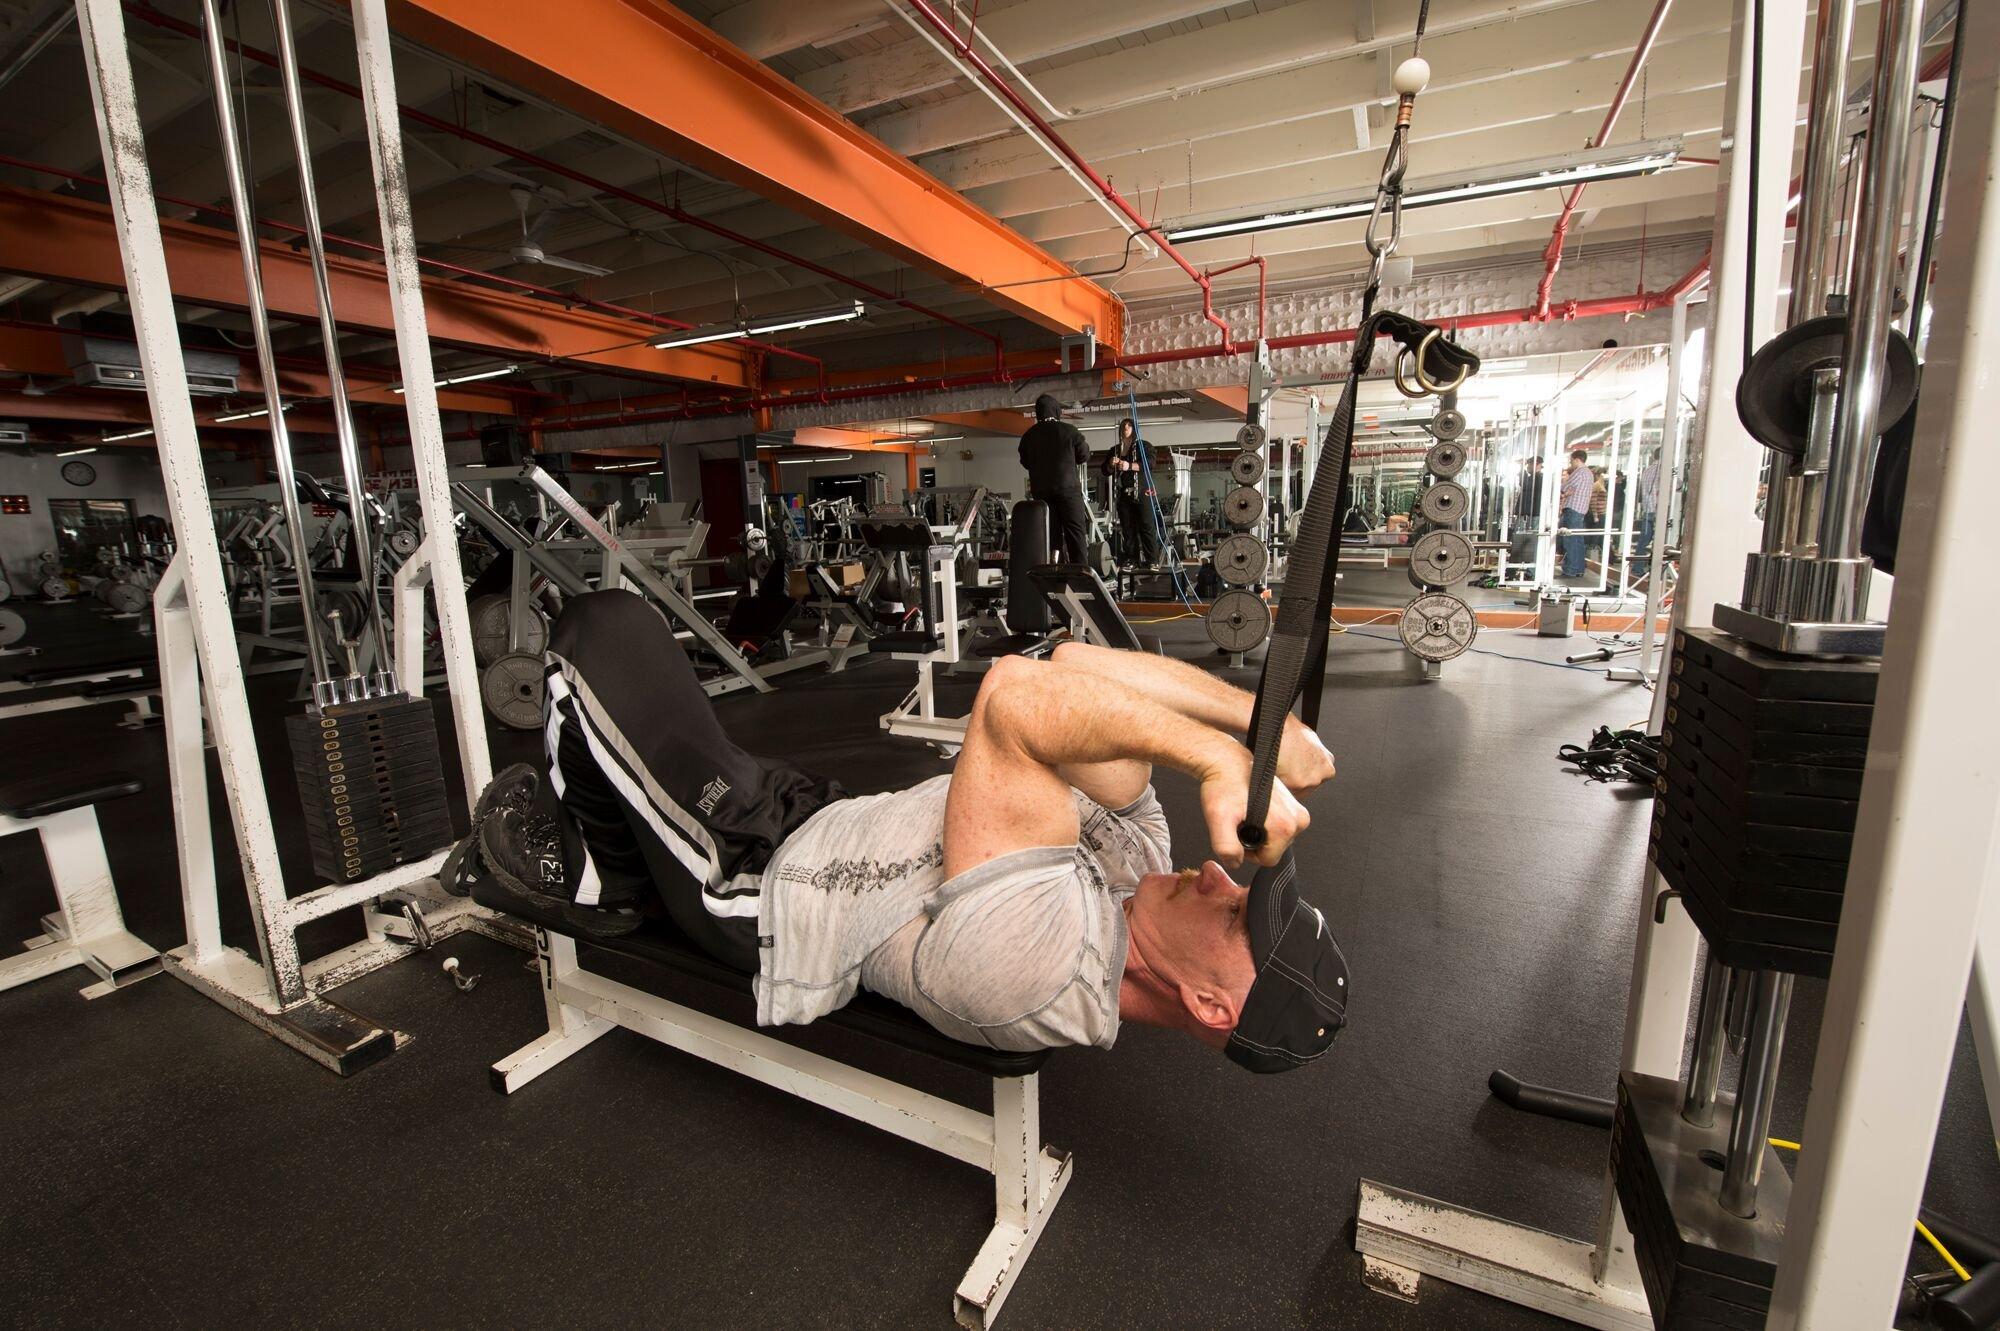 Ironcompany.com LPG Muscle DELT-Belt Dumbbell Upright Row Straps - Multi-Use Straps